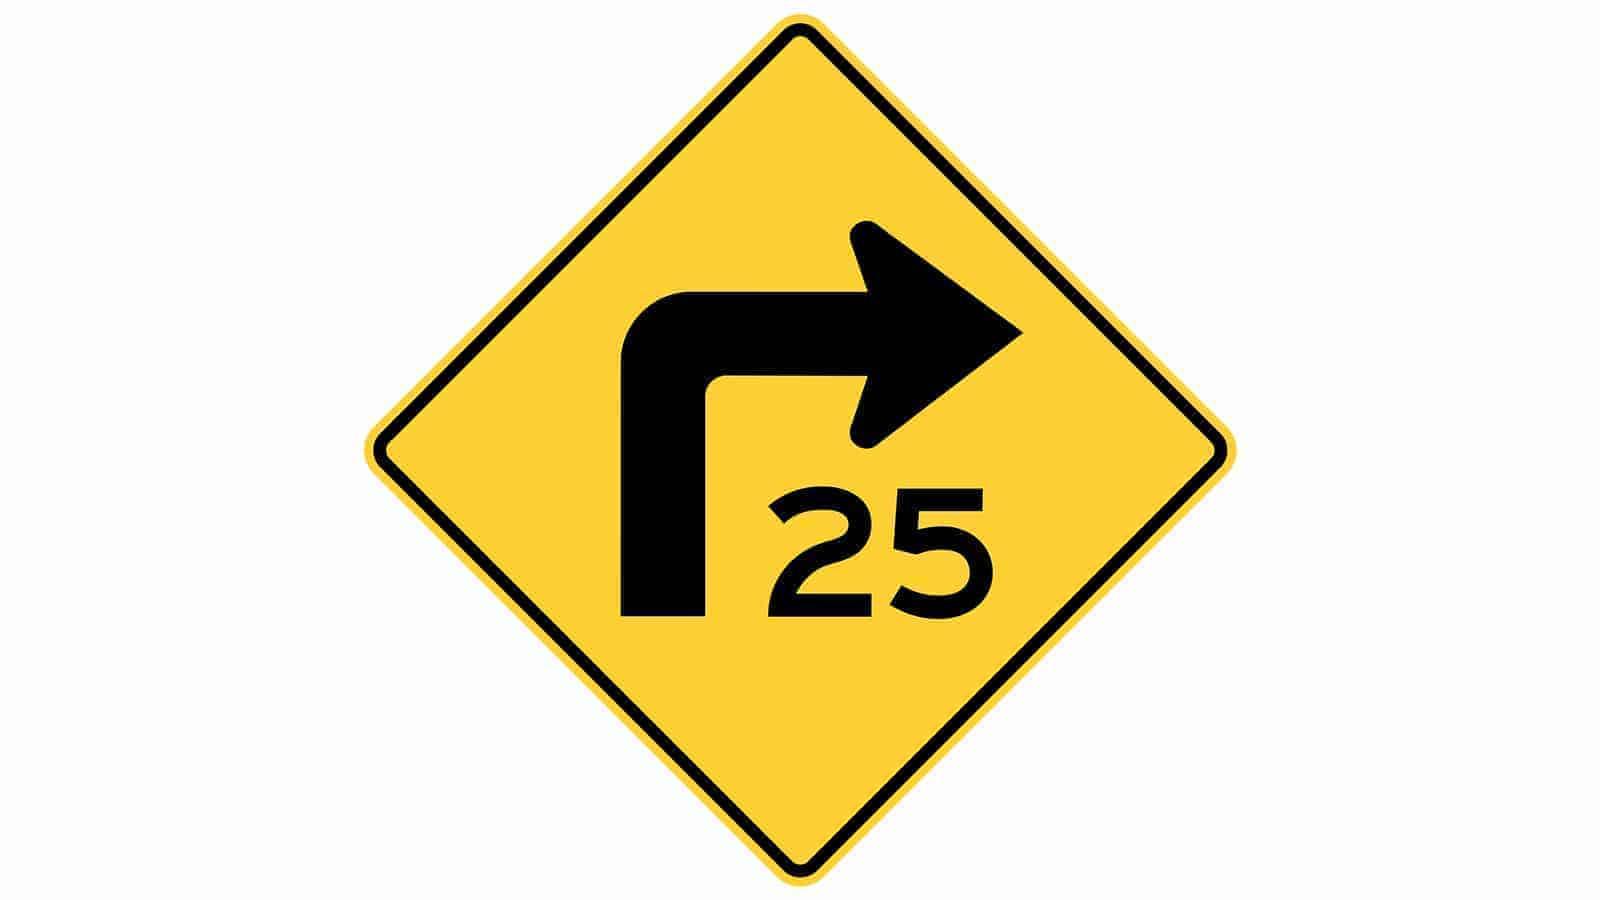 Warning sign turn left advisory speed